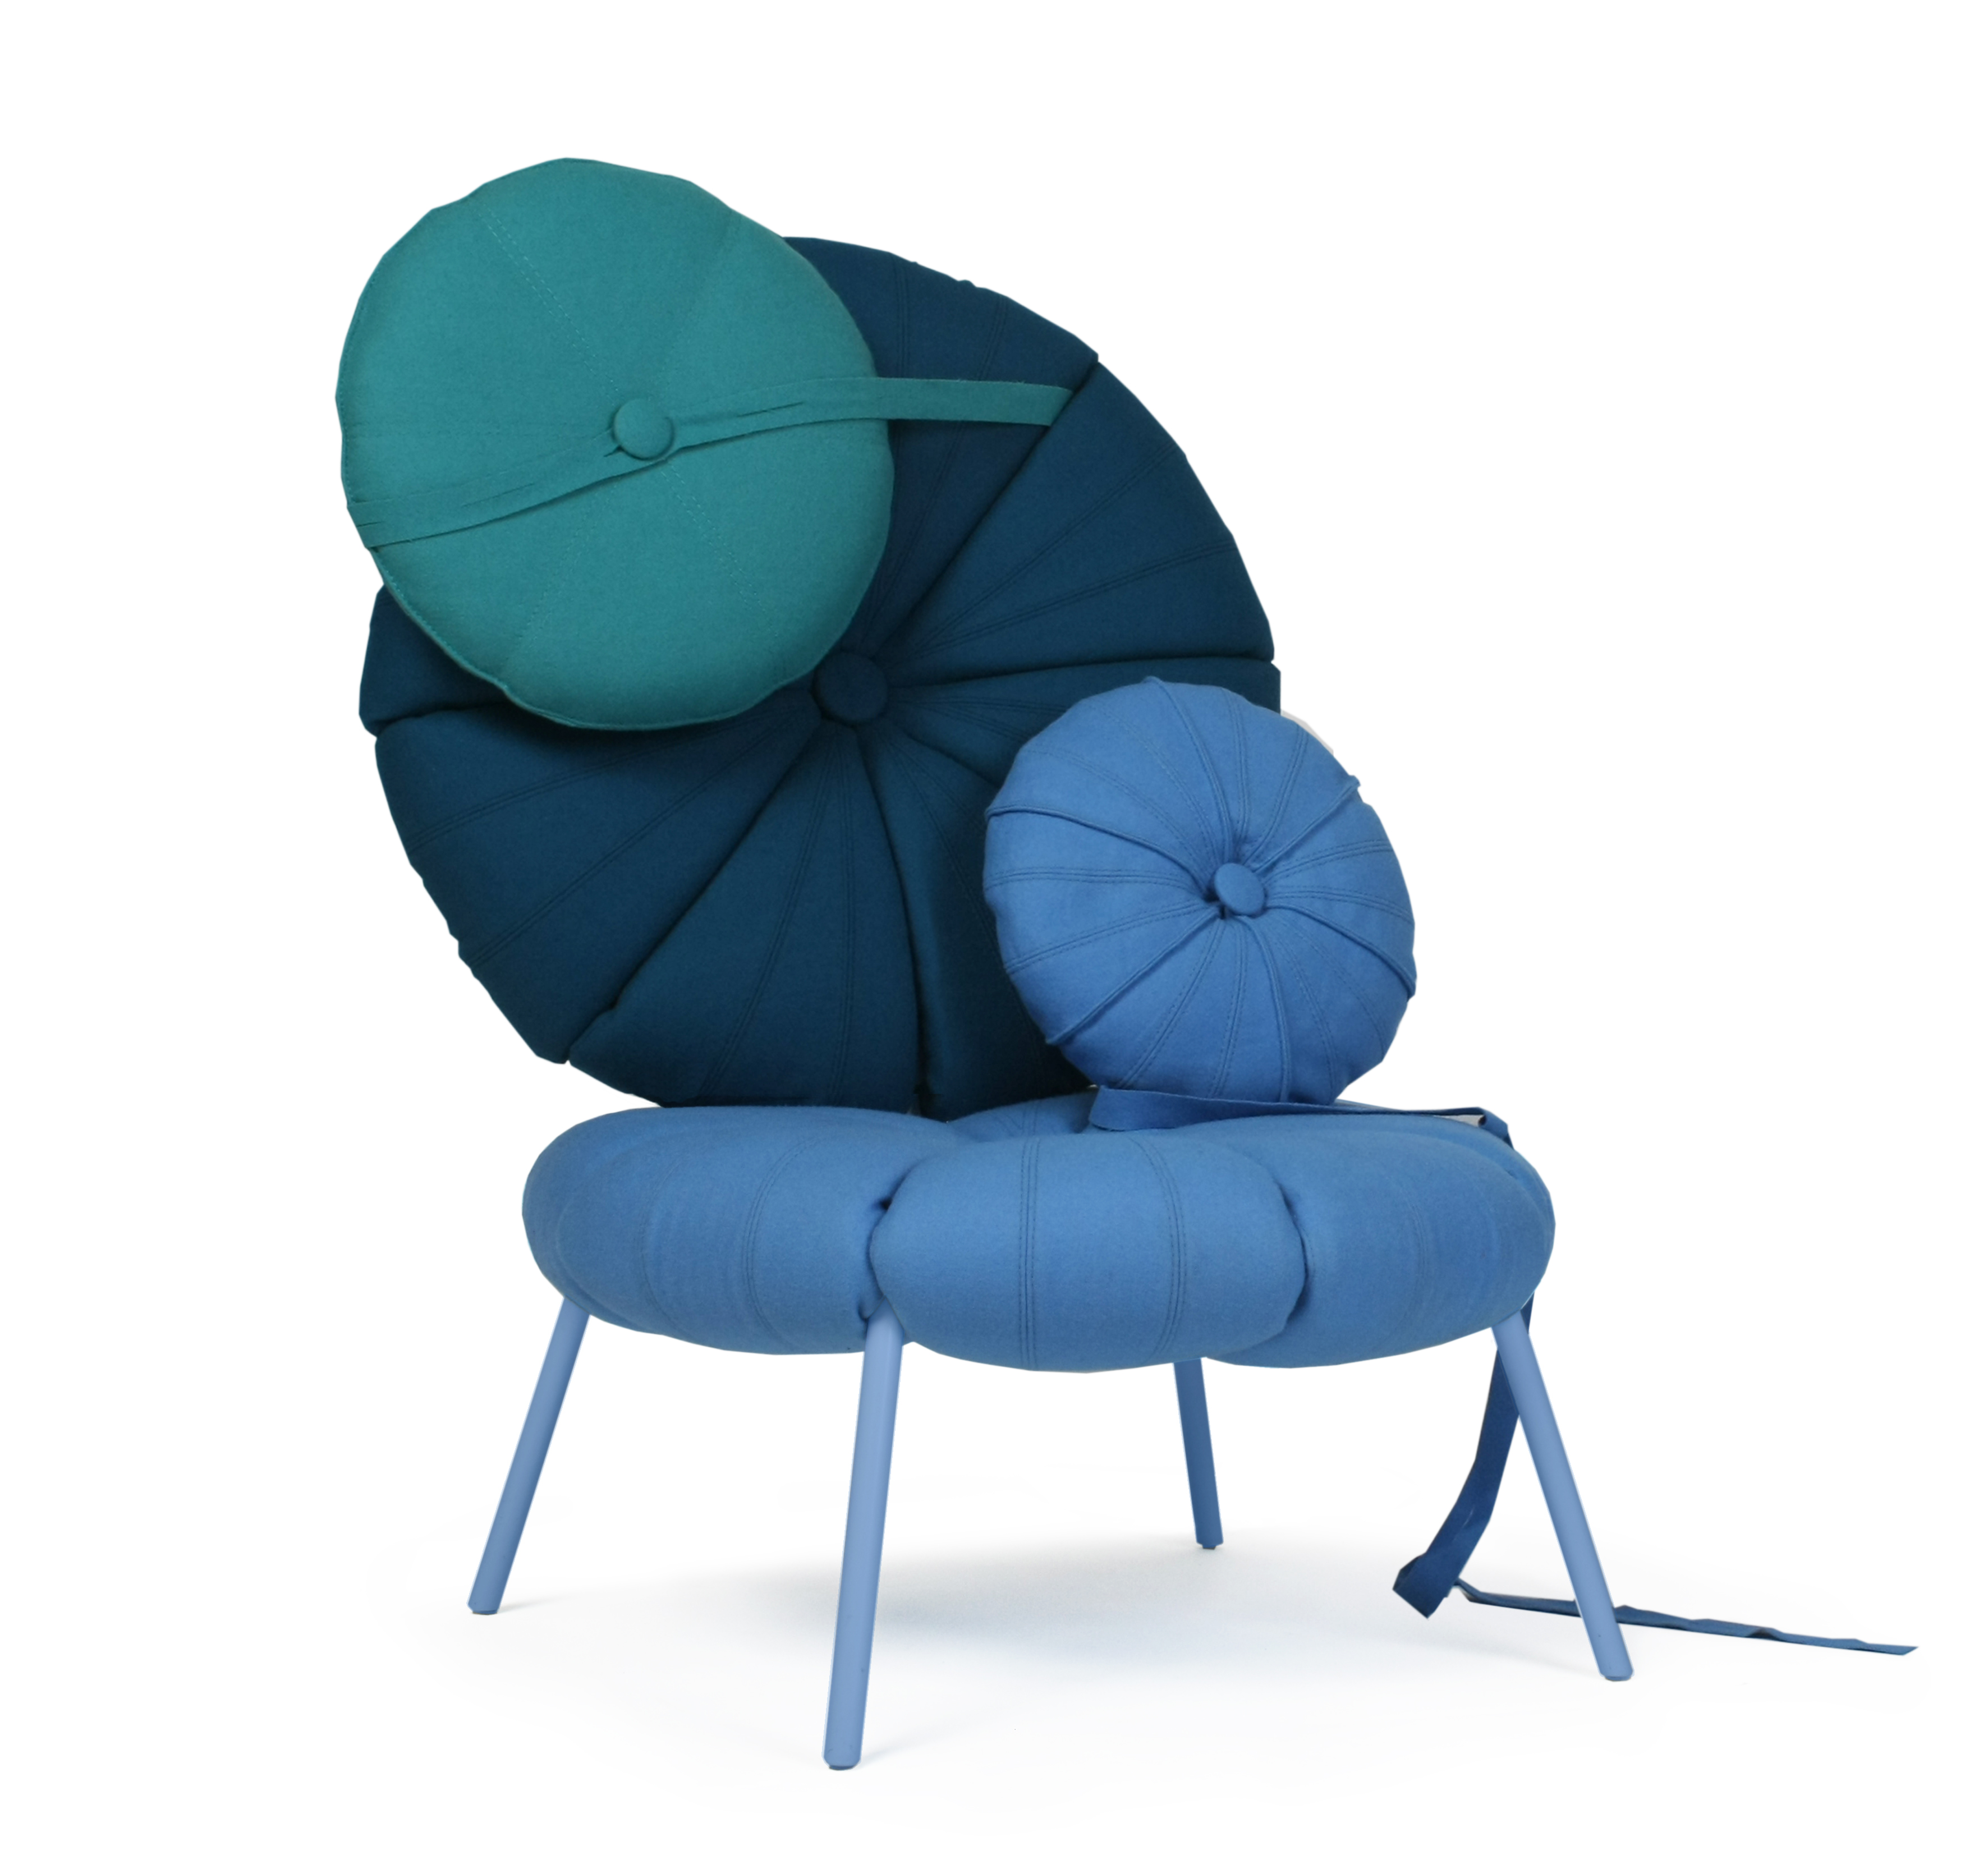 modern design young guns 2014 Karoline Fesser woonling collection chairs